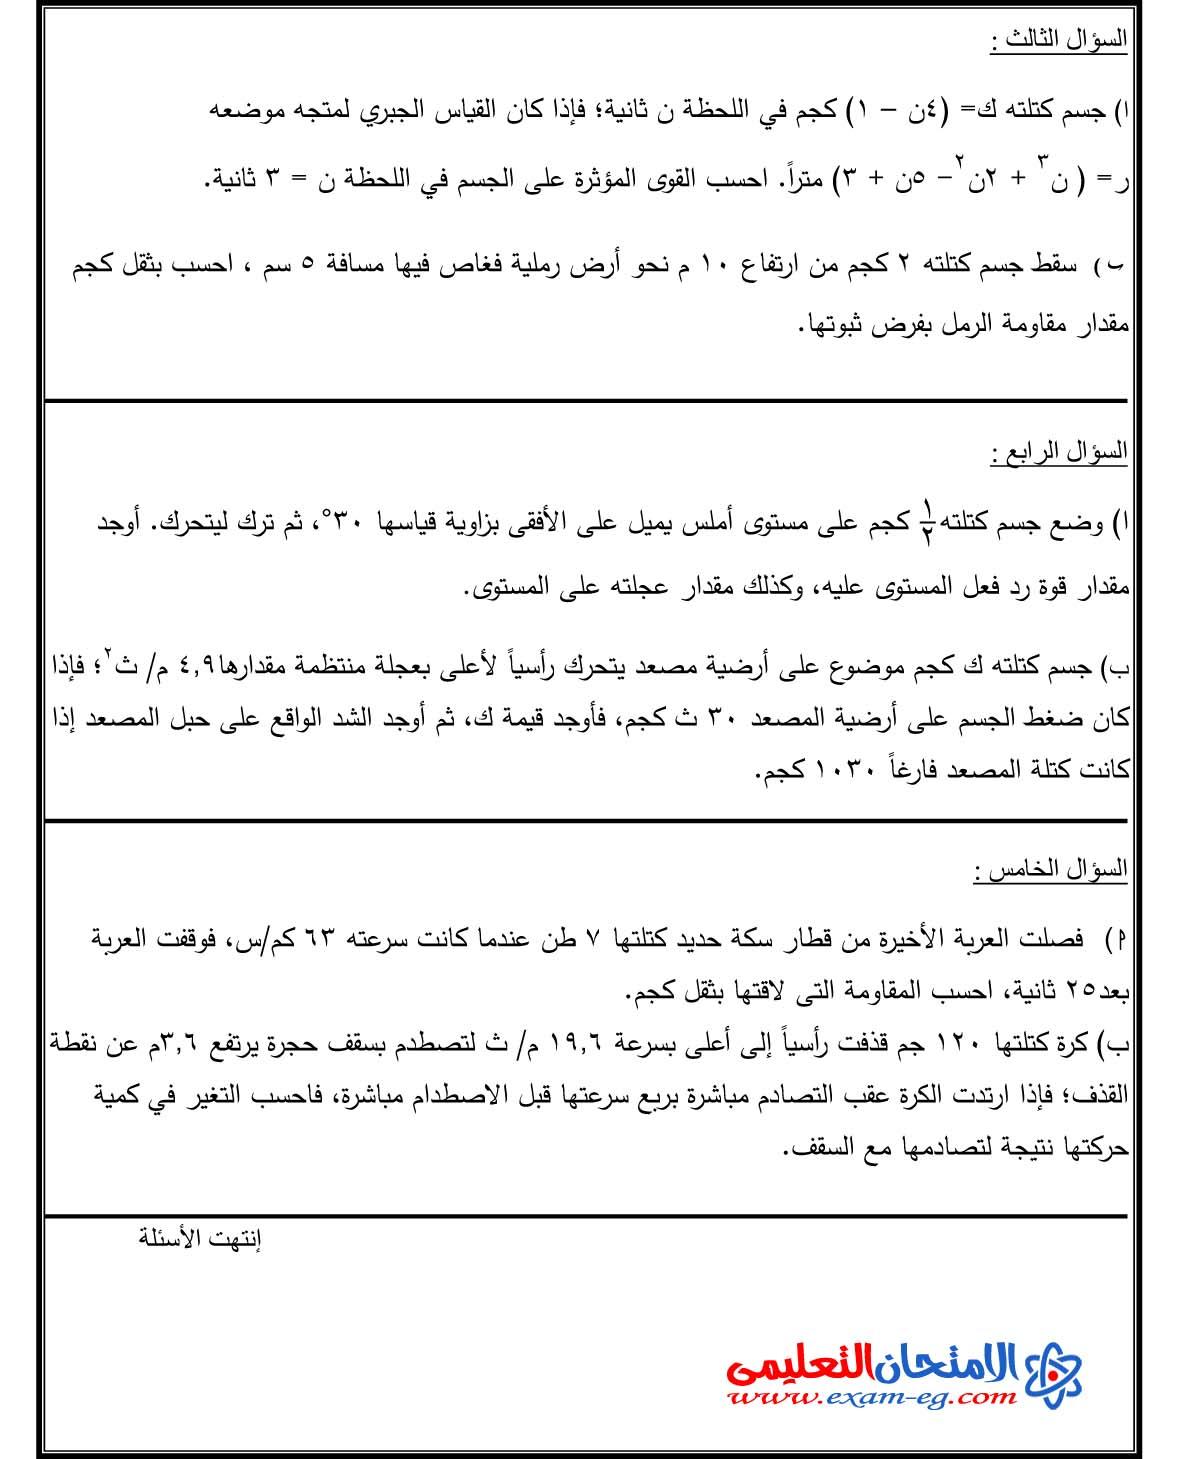 exam-eg.com_1460420681158.jpg